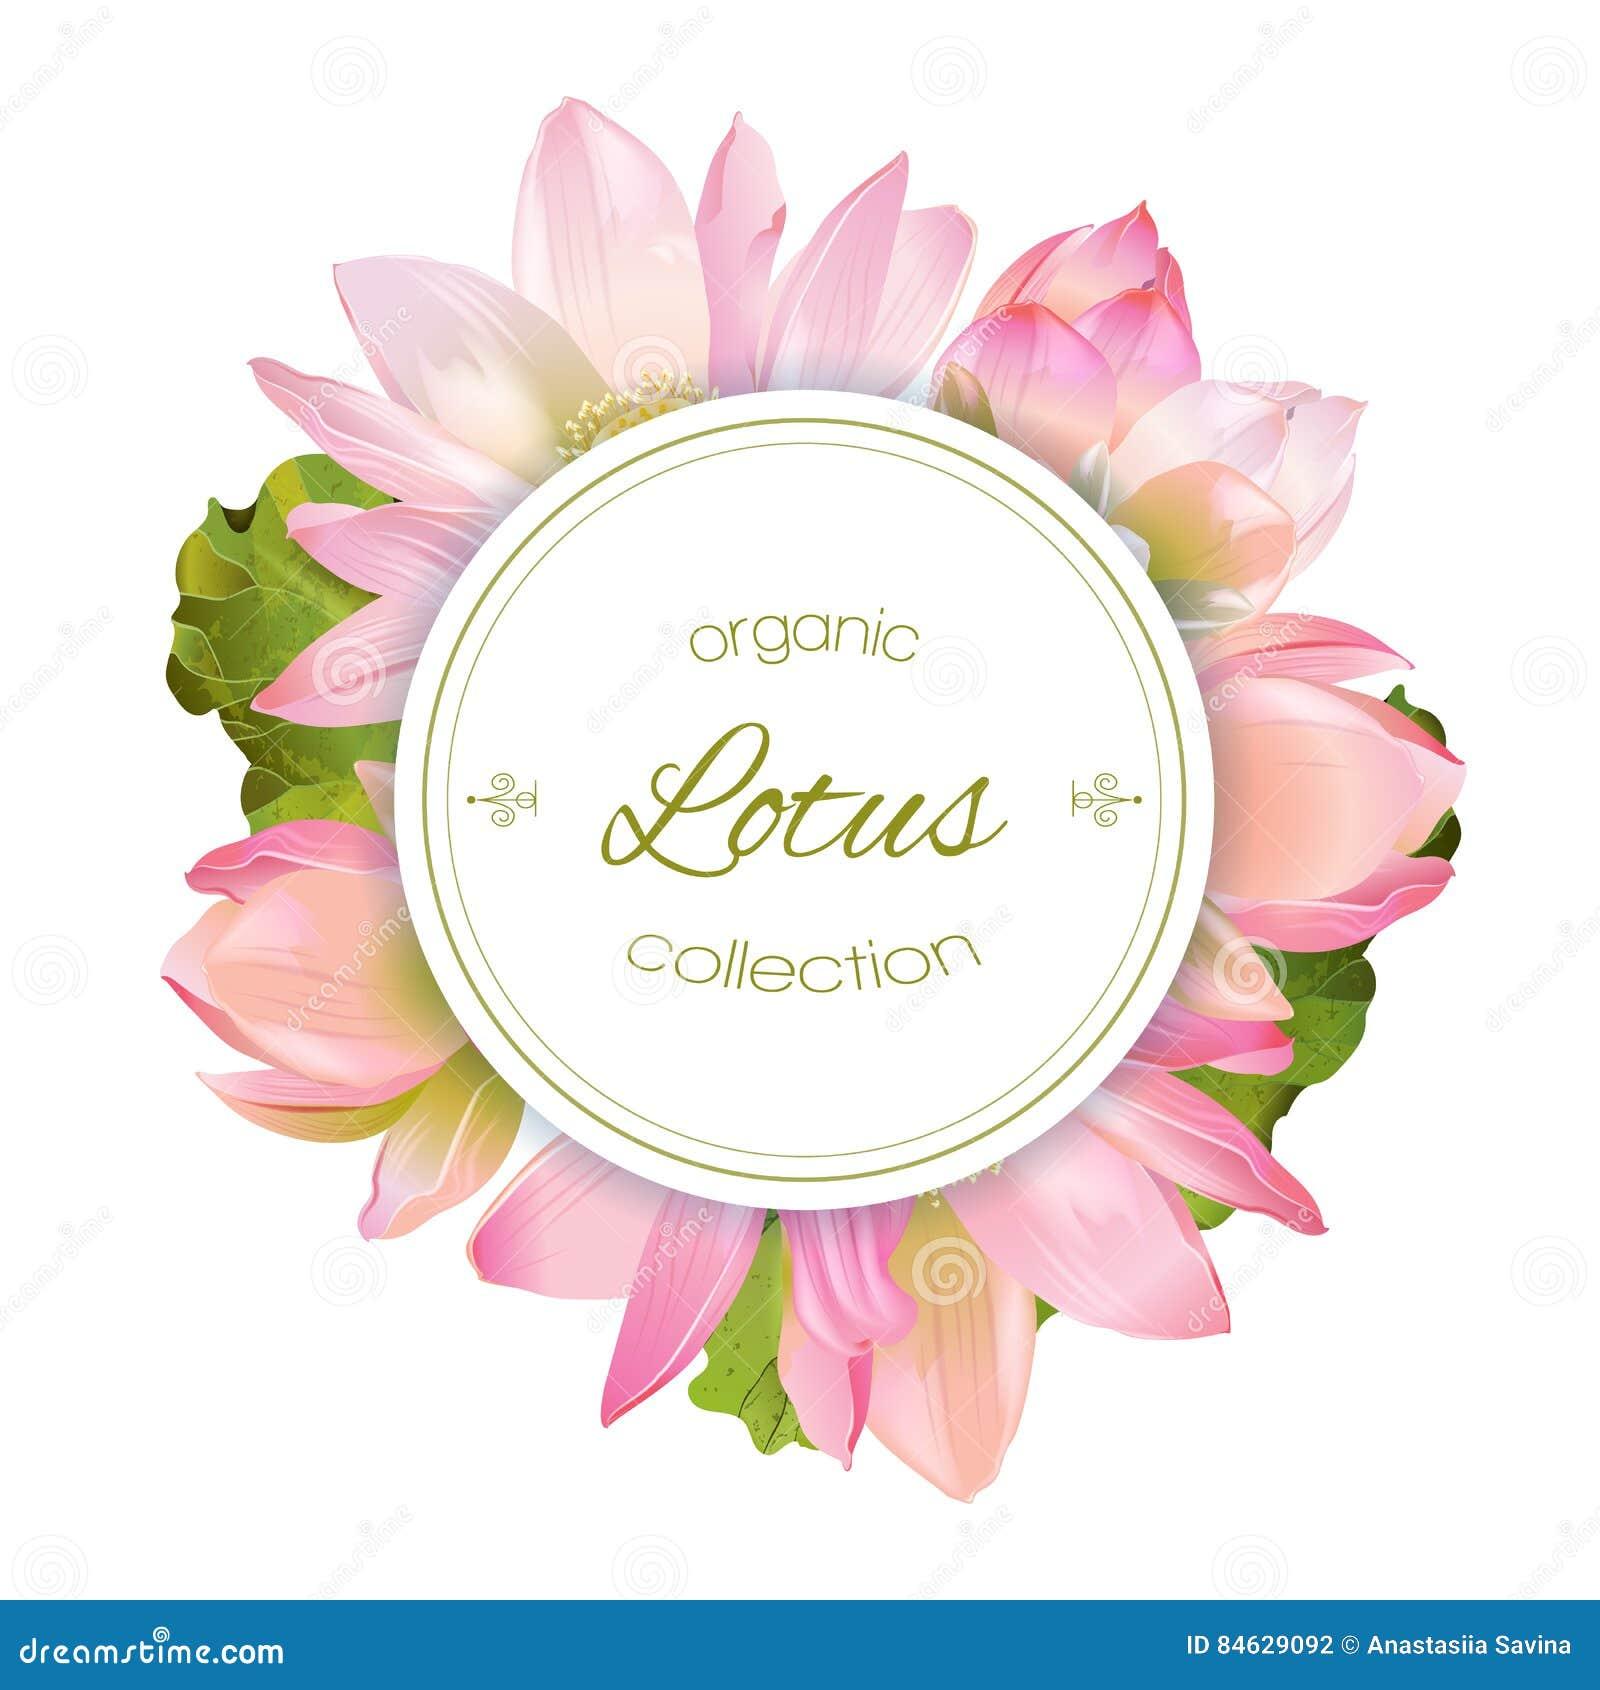 Lotus flower banner stock vector image 84629092 lotus flower banner dhlflorist Gallery